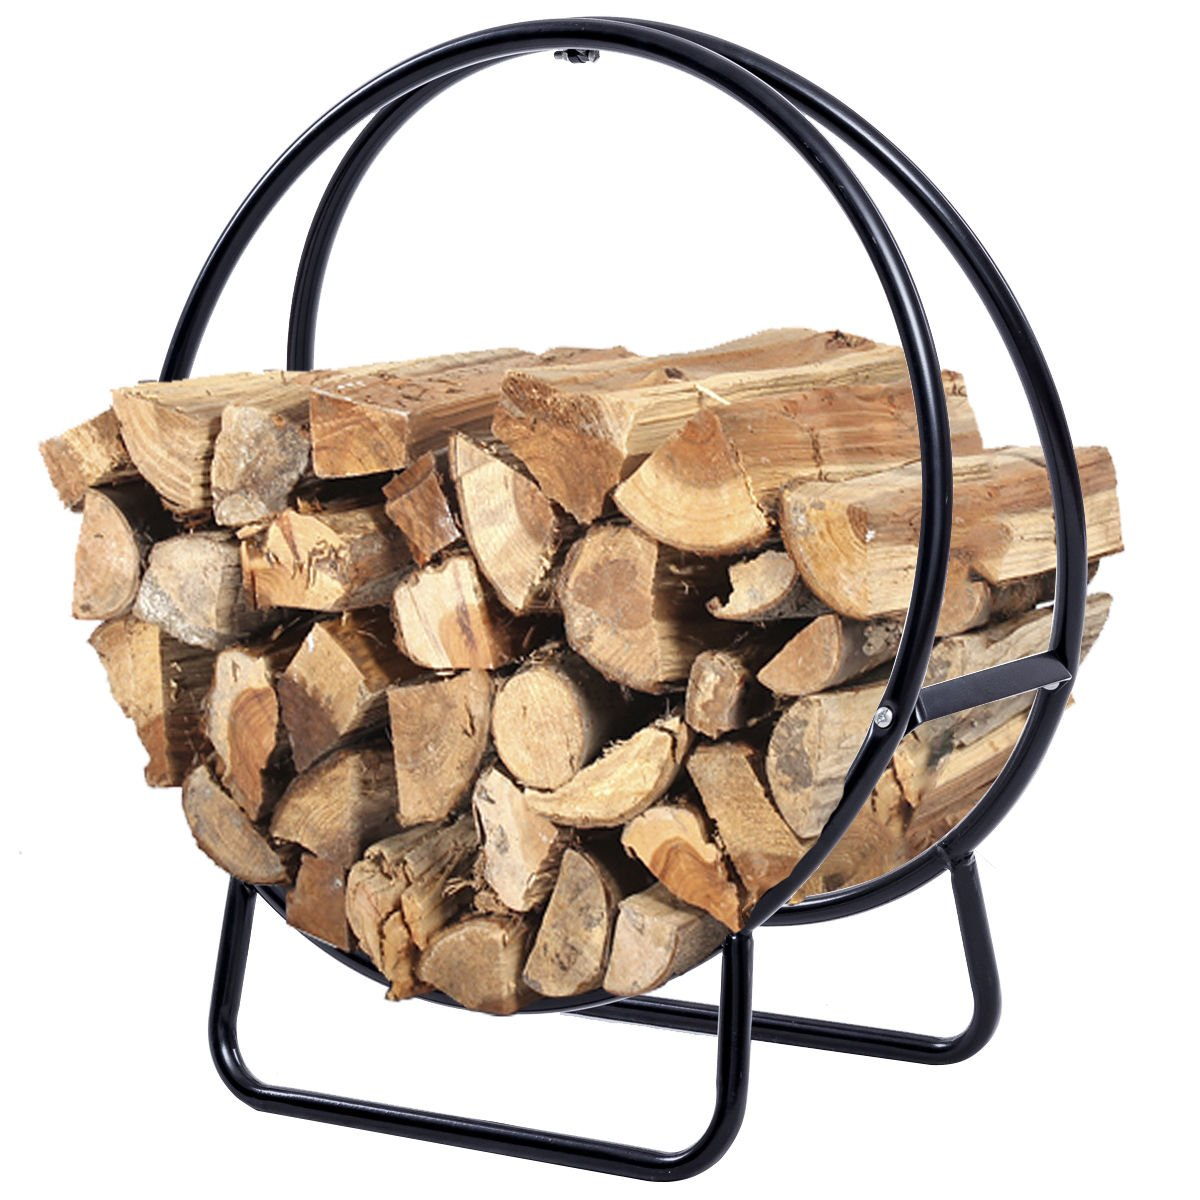 GJH One Firewood Storage Rack Holder Round Tubular Steel Log Hoop Display 2 Feet 24''x 9.8''x 27.6'' by GJH One